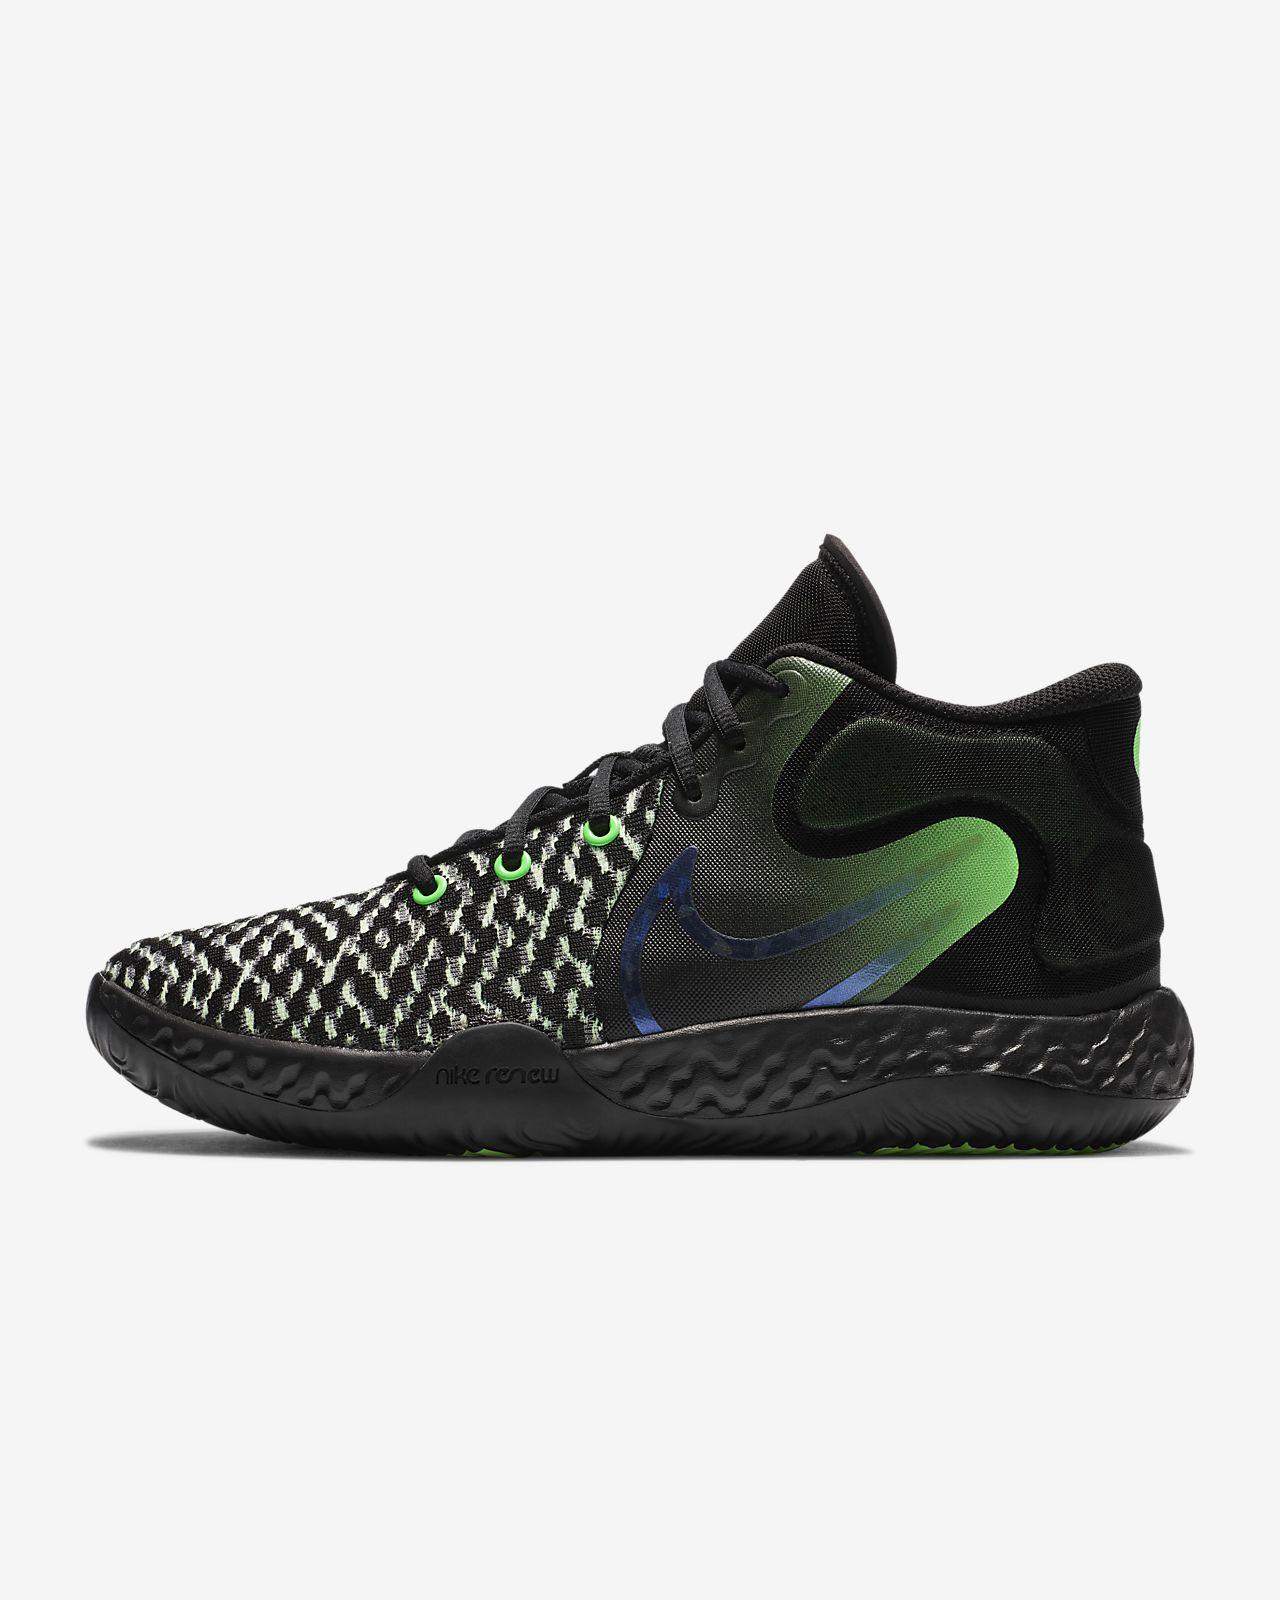 KD Trey 5 VIII EP Basketball Shoe